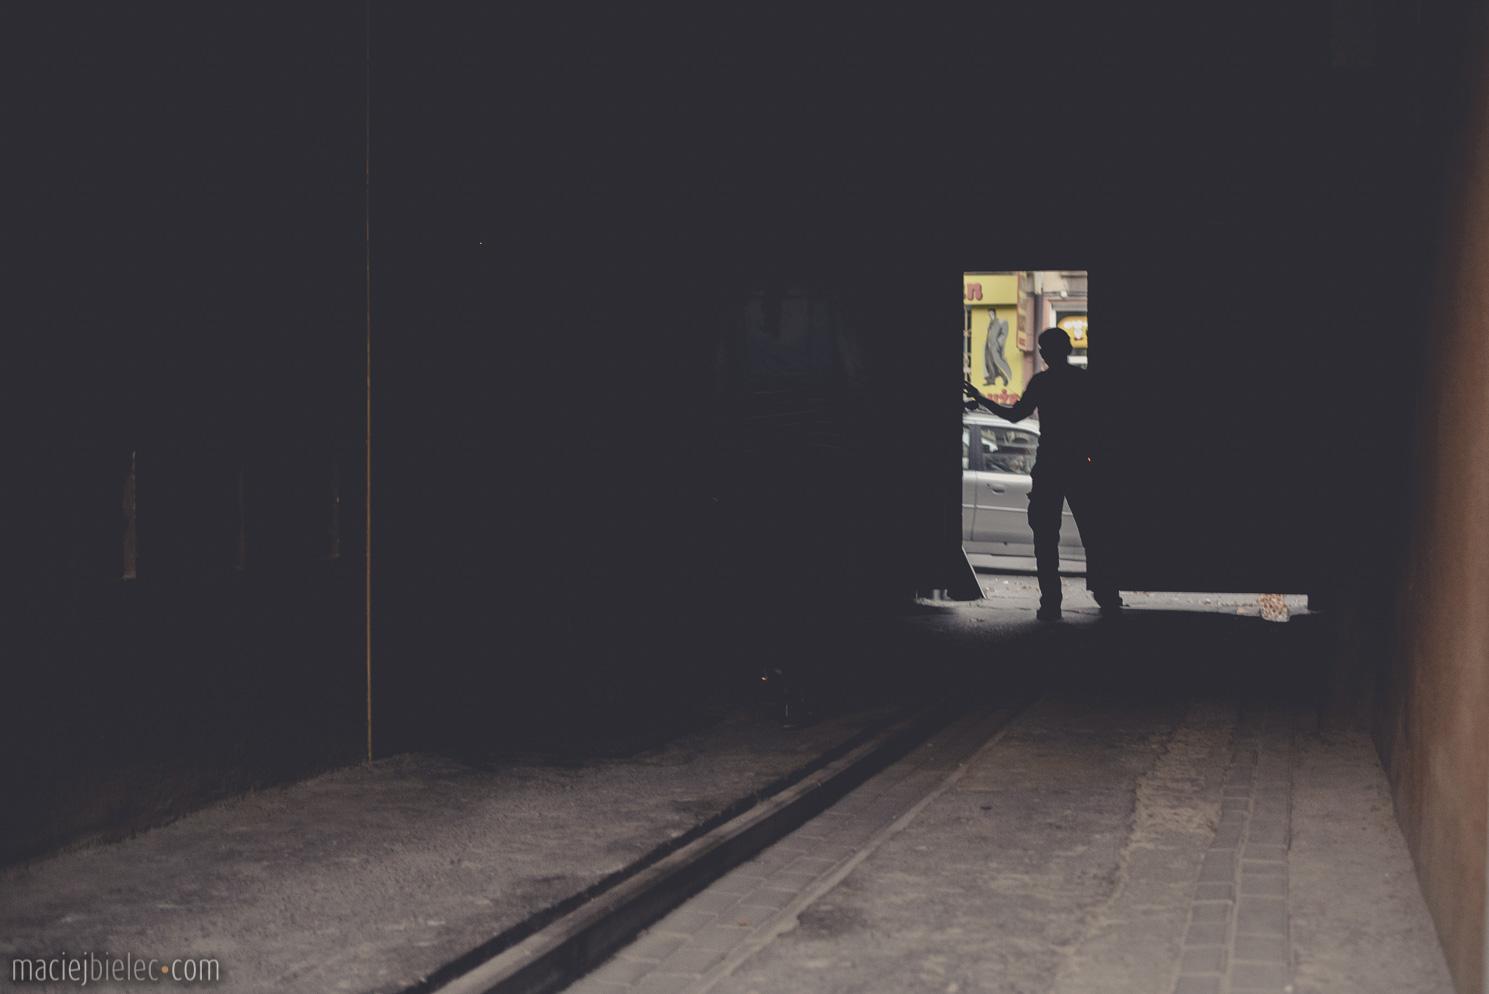 Ciemna brama i aparat